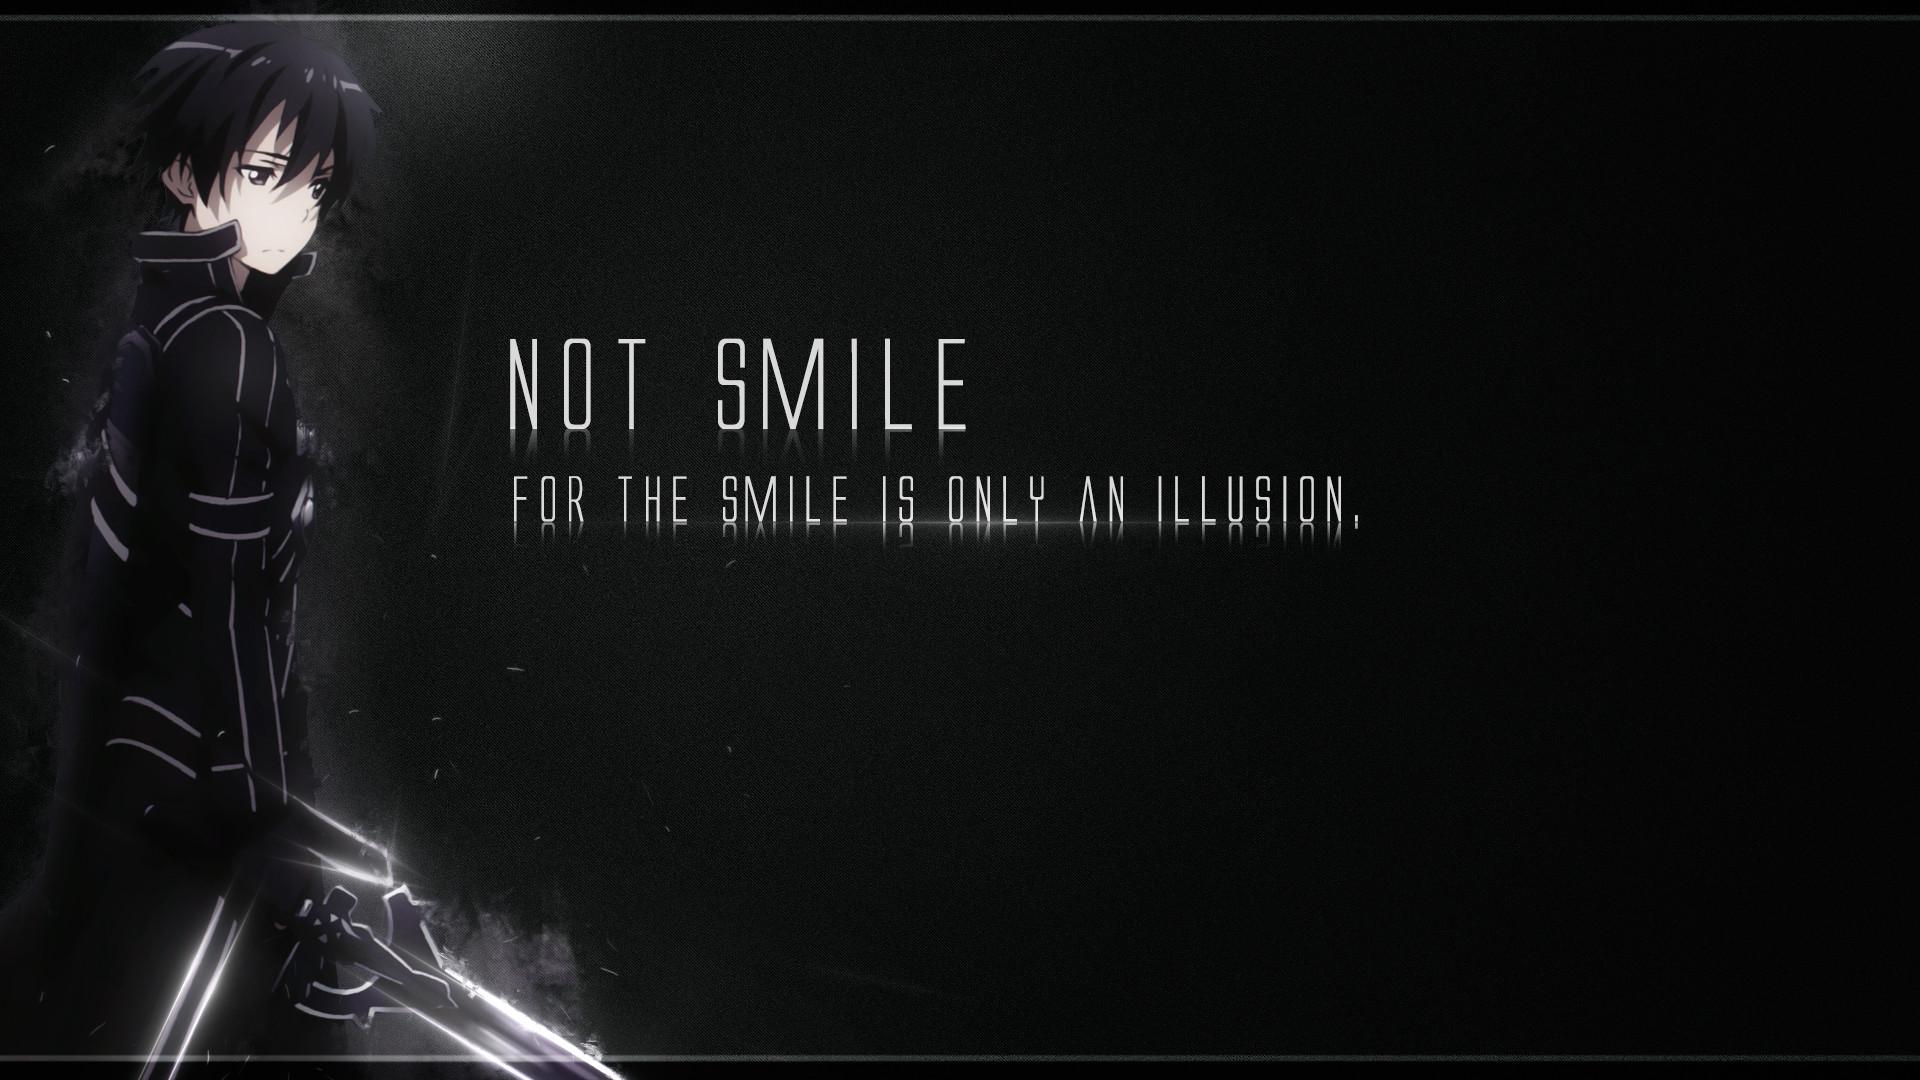 … Kirito(Sword Art Online) – Not Smile. by JuliannMiic